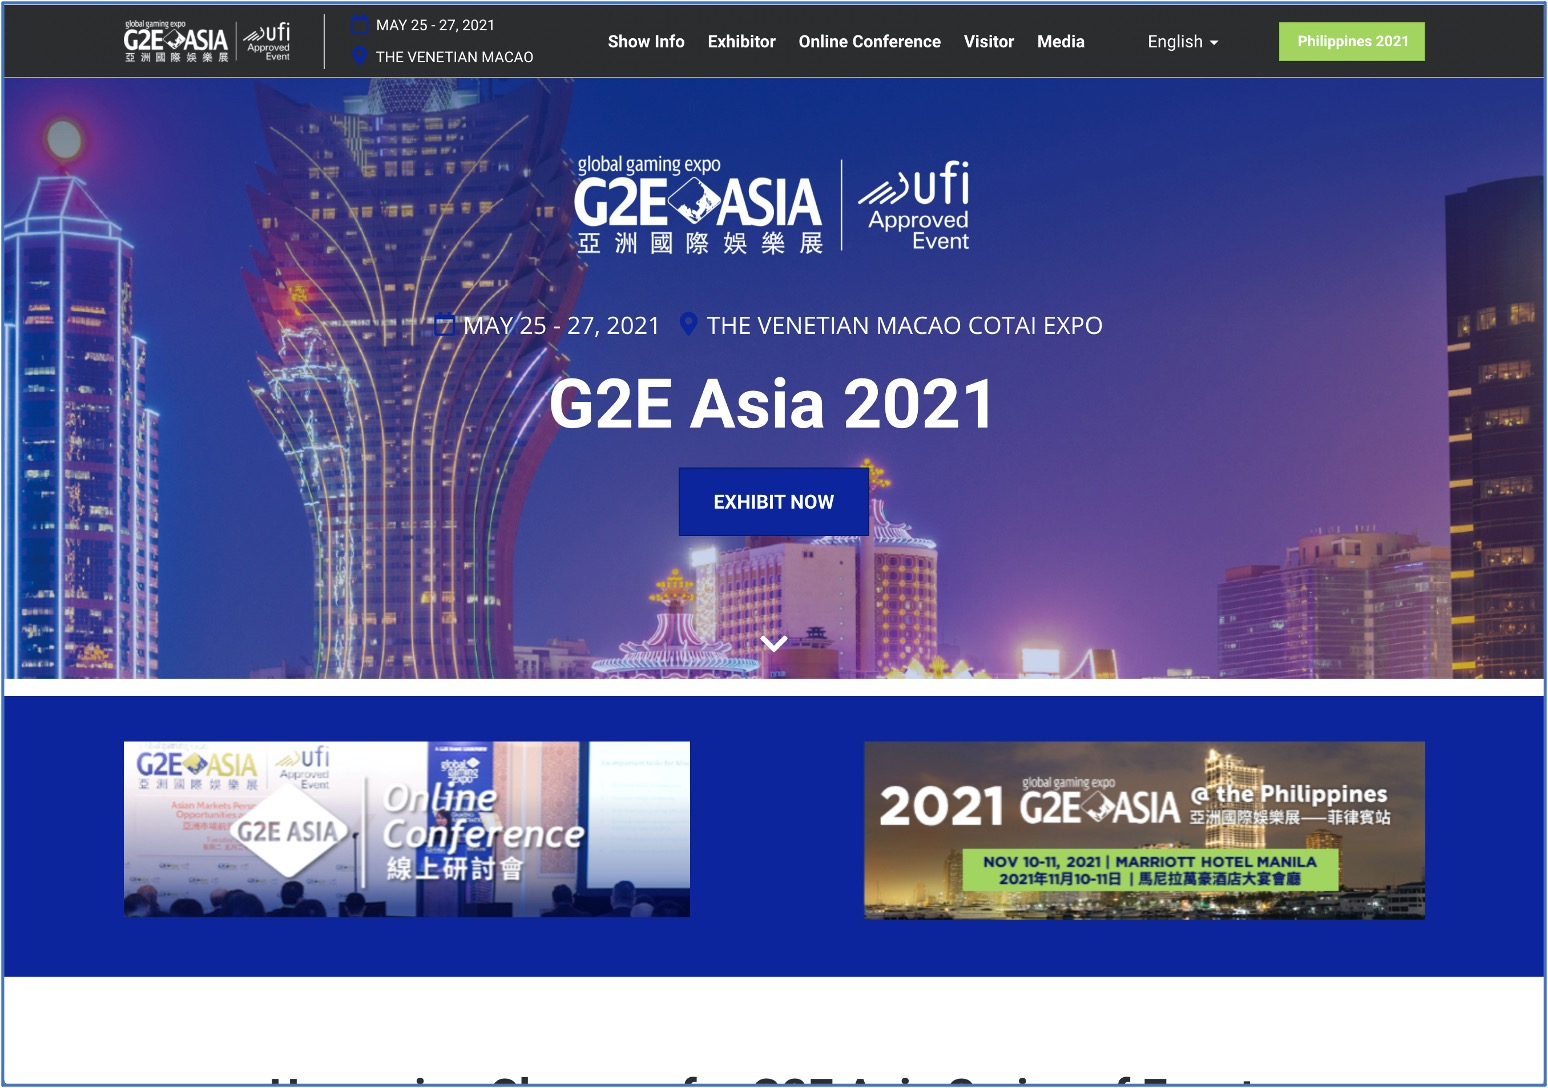 G2e Asia 2021